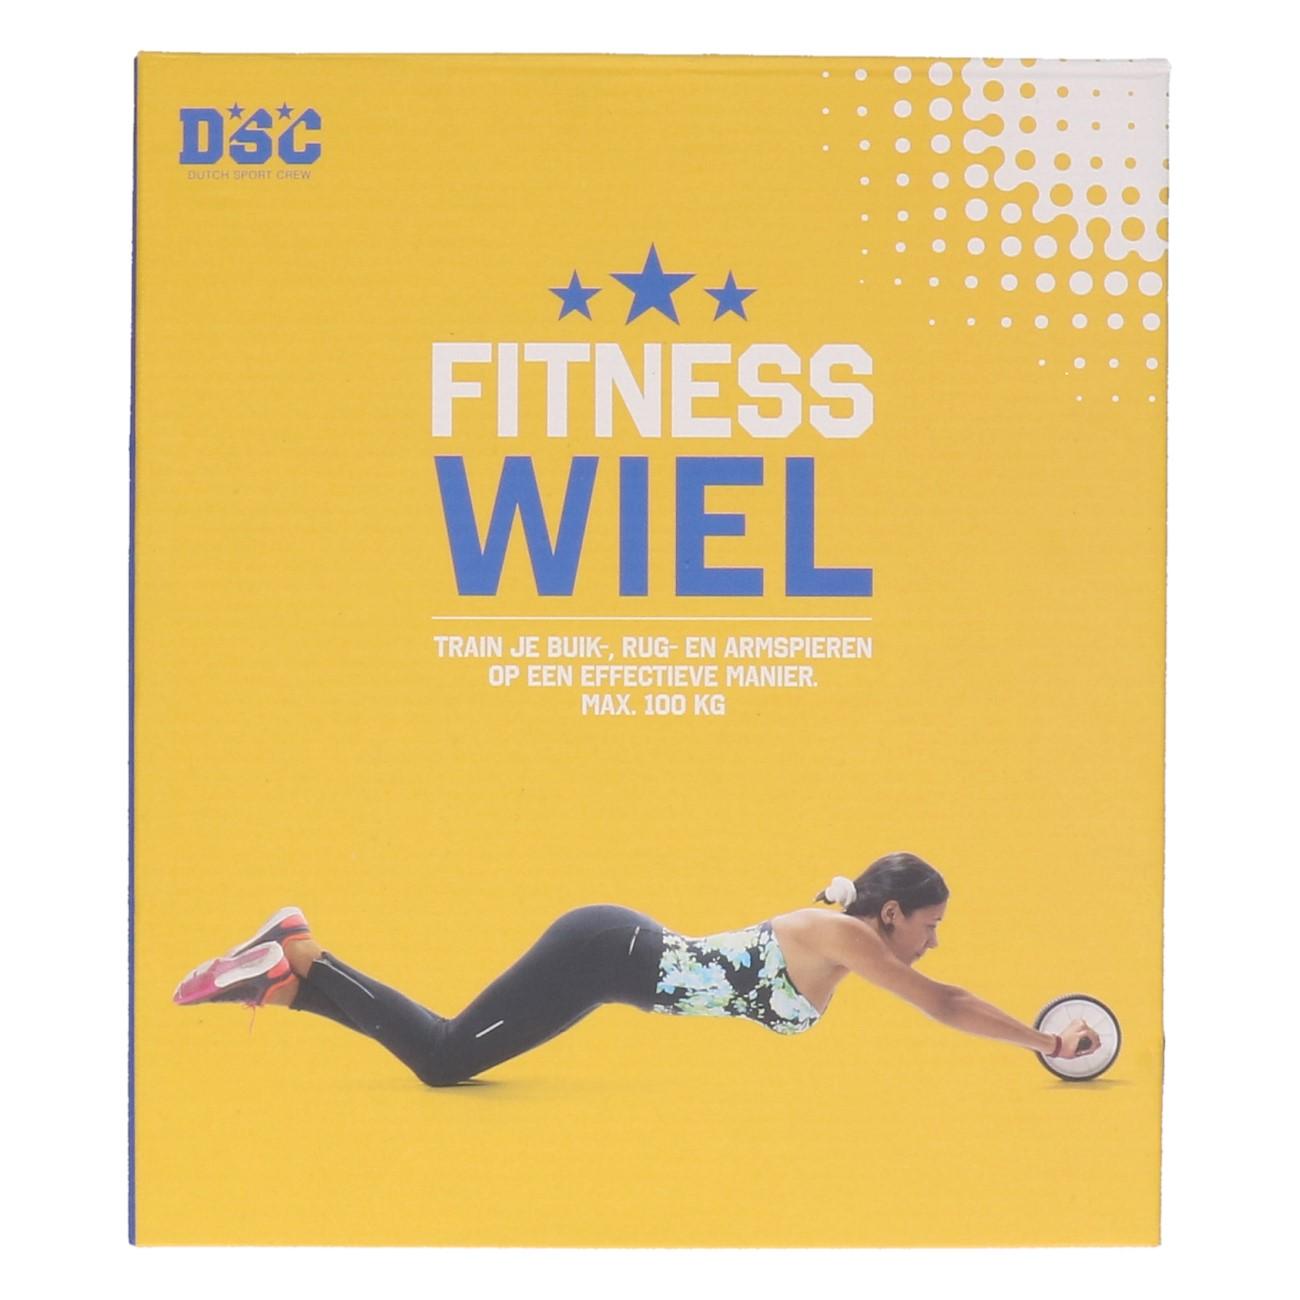 Fitness wiel